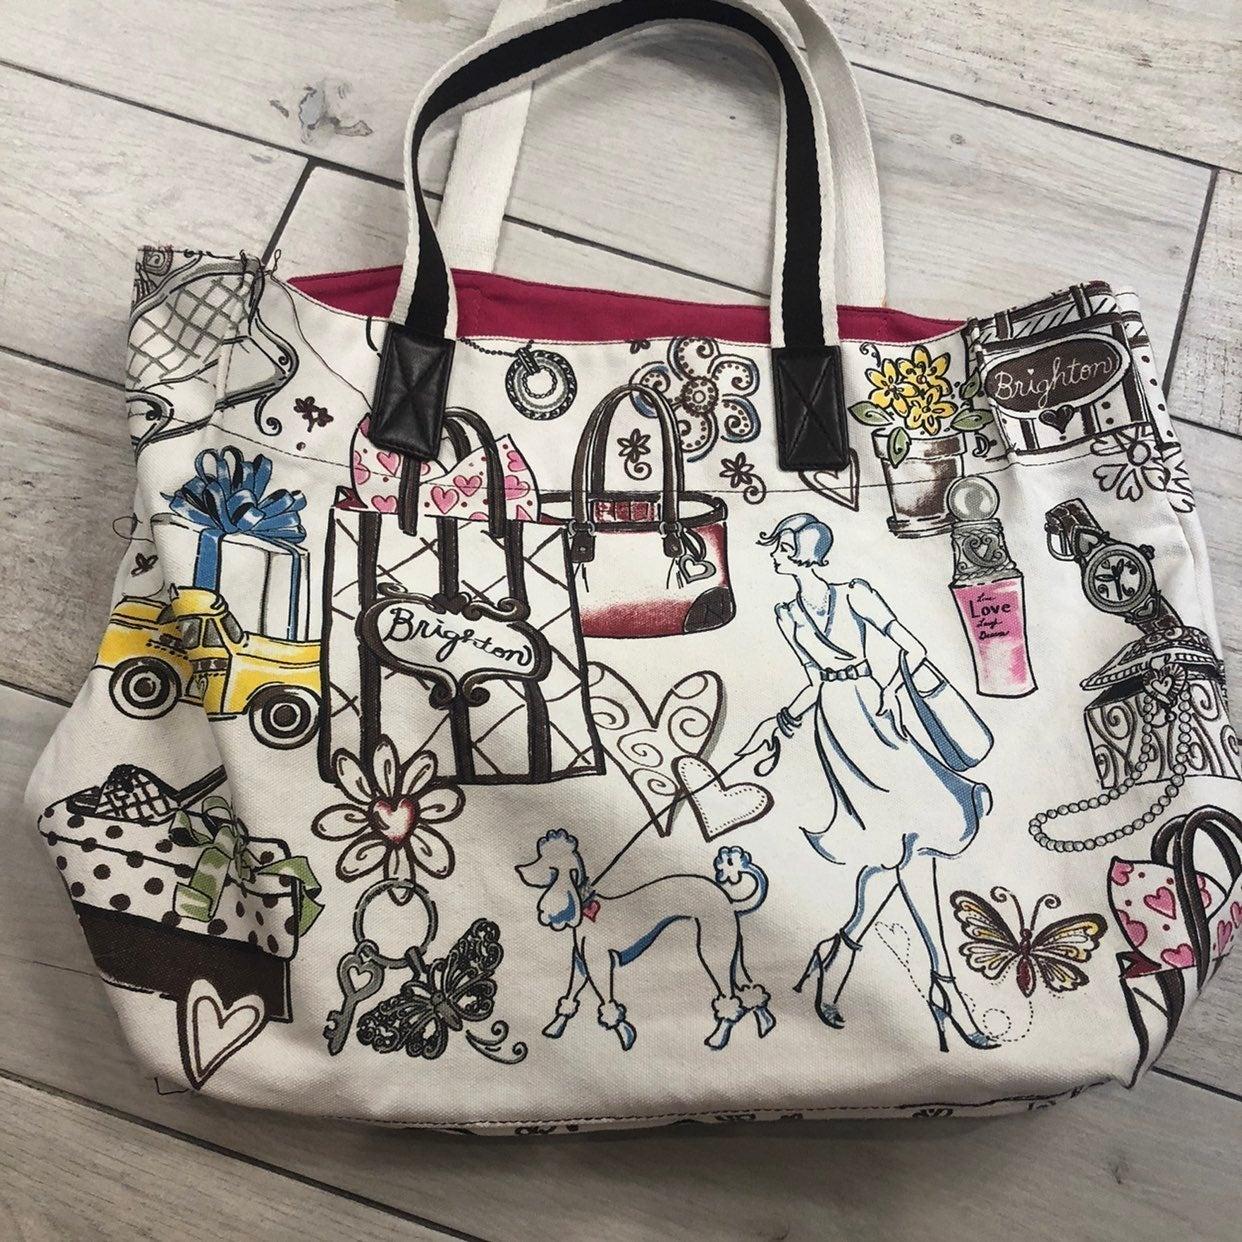 Brighton Beach bag tote